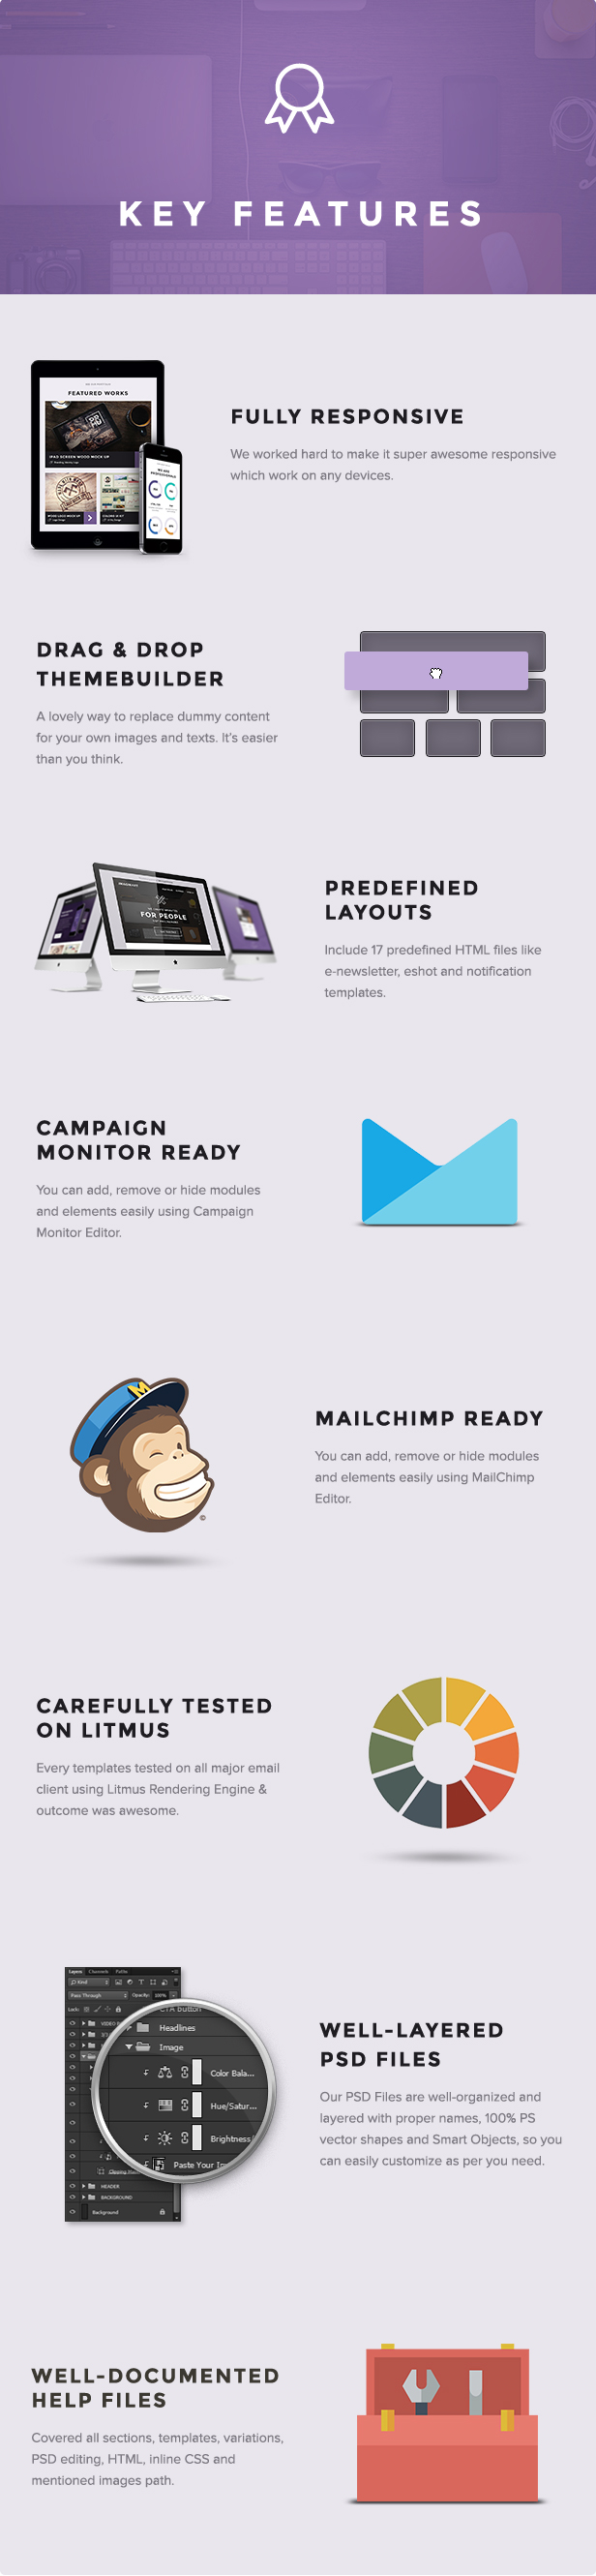 Imaginary - Multipurpose Email Template + Builder Access - 8